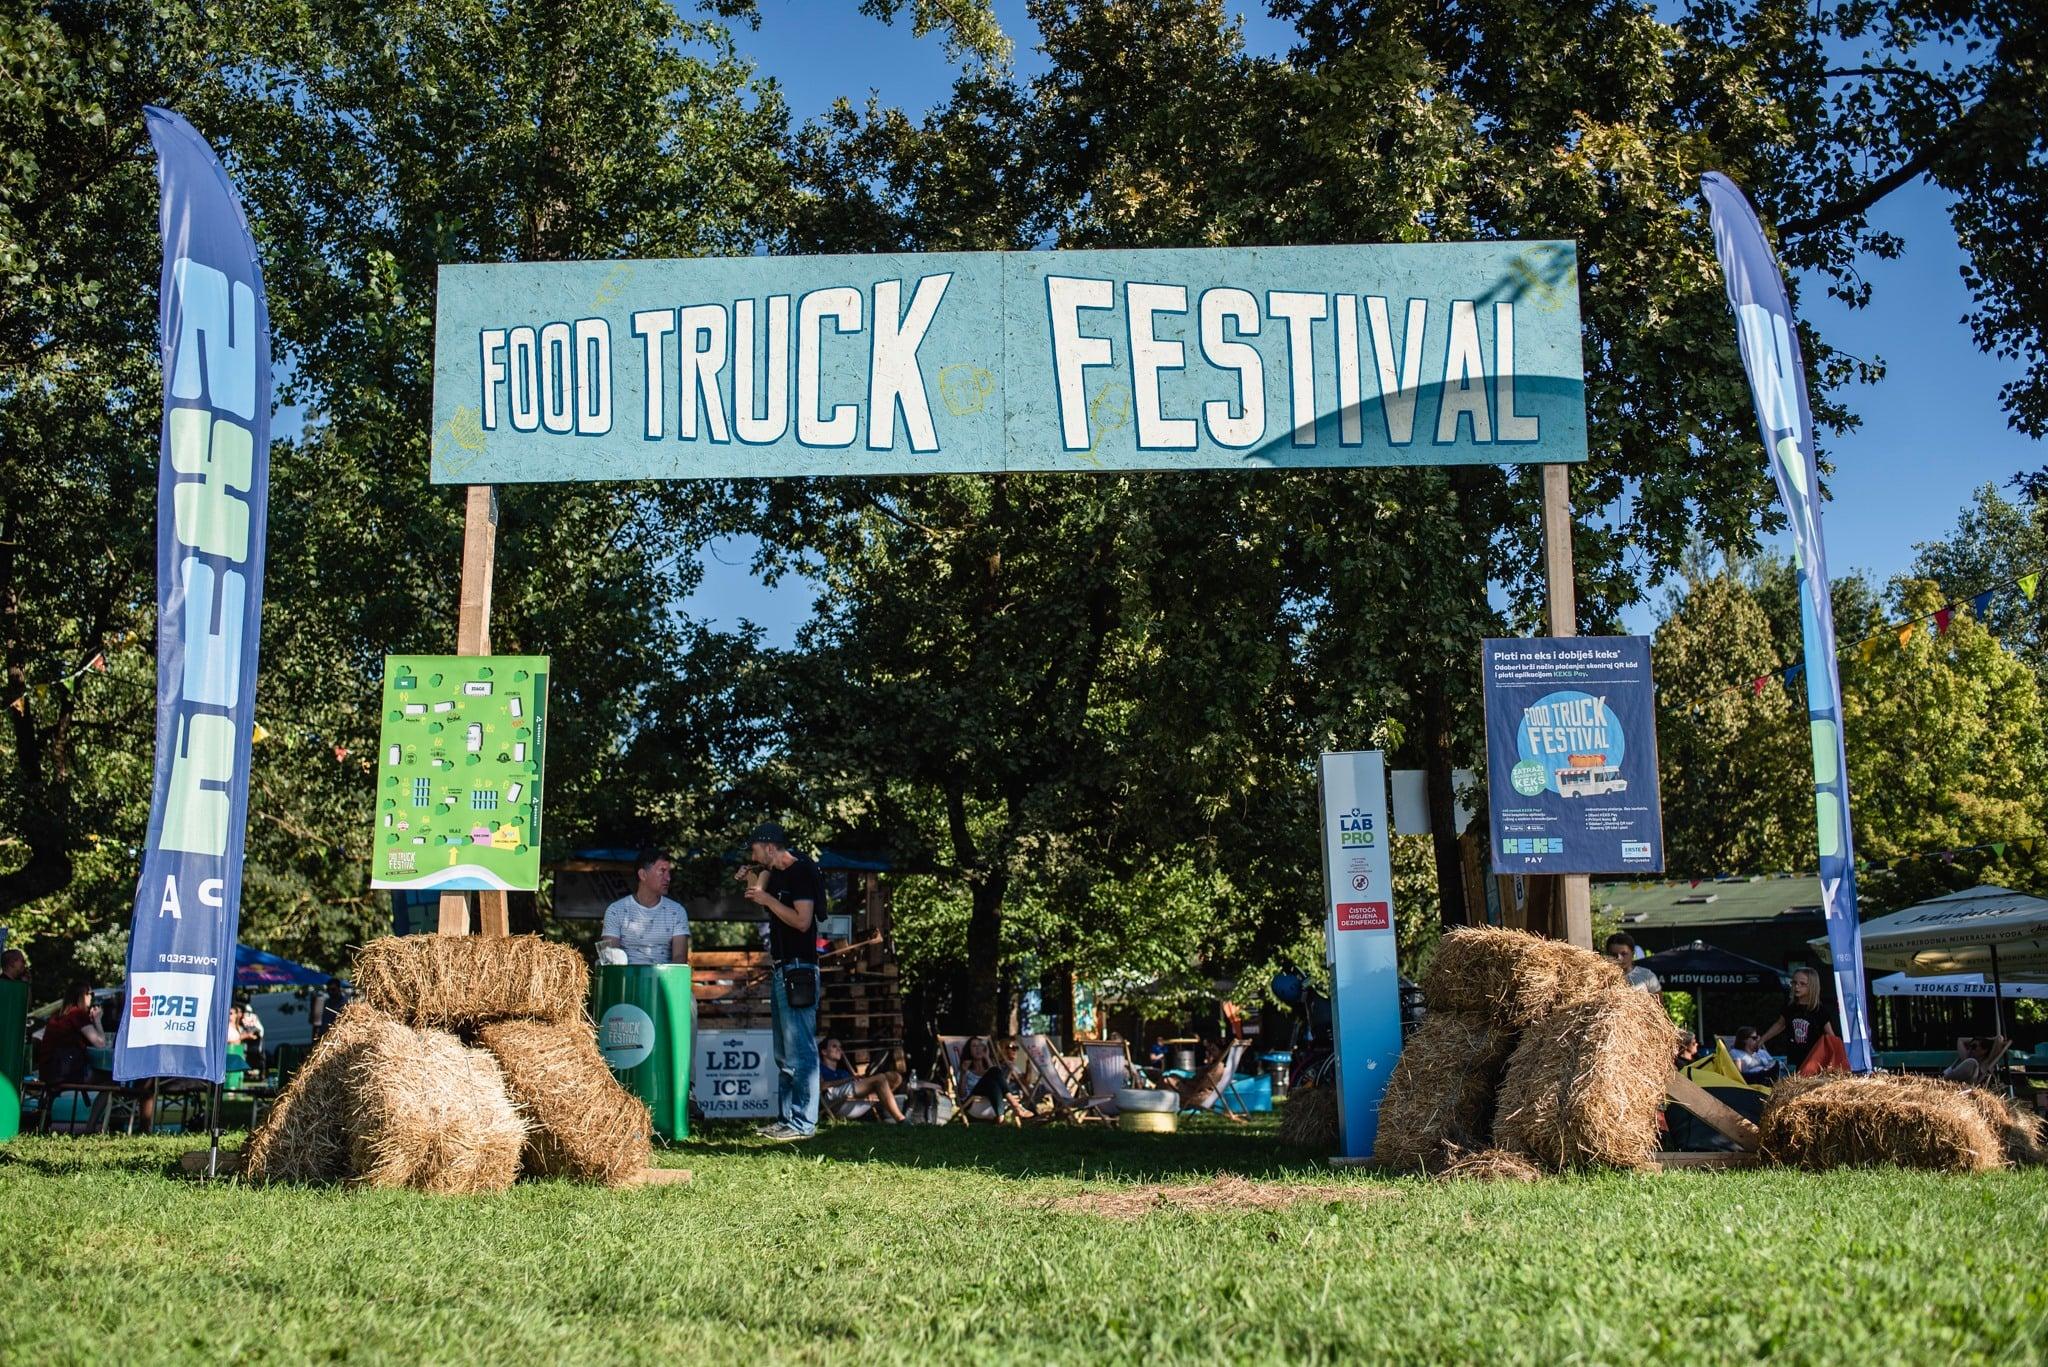 First Croatian Food Truck Festival listed in European Street Food Awards